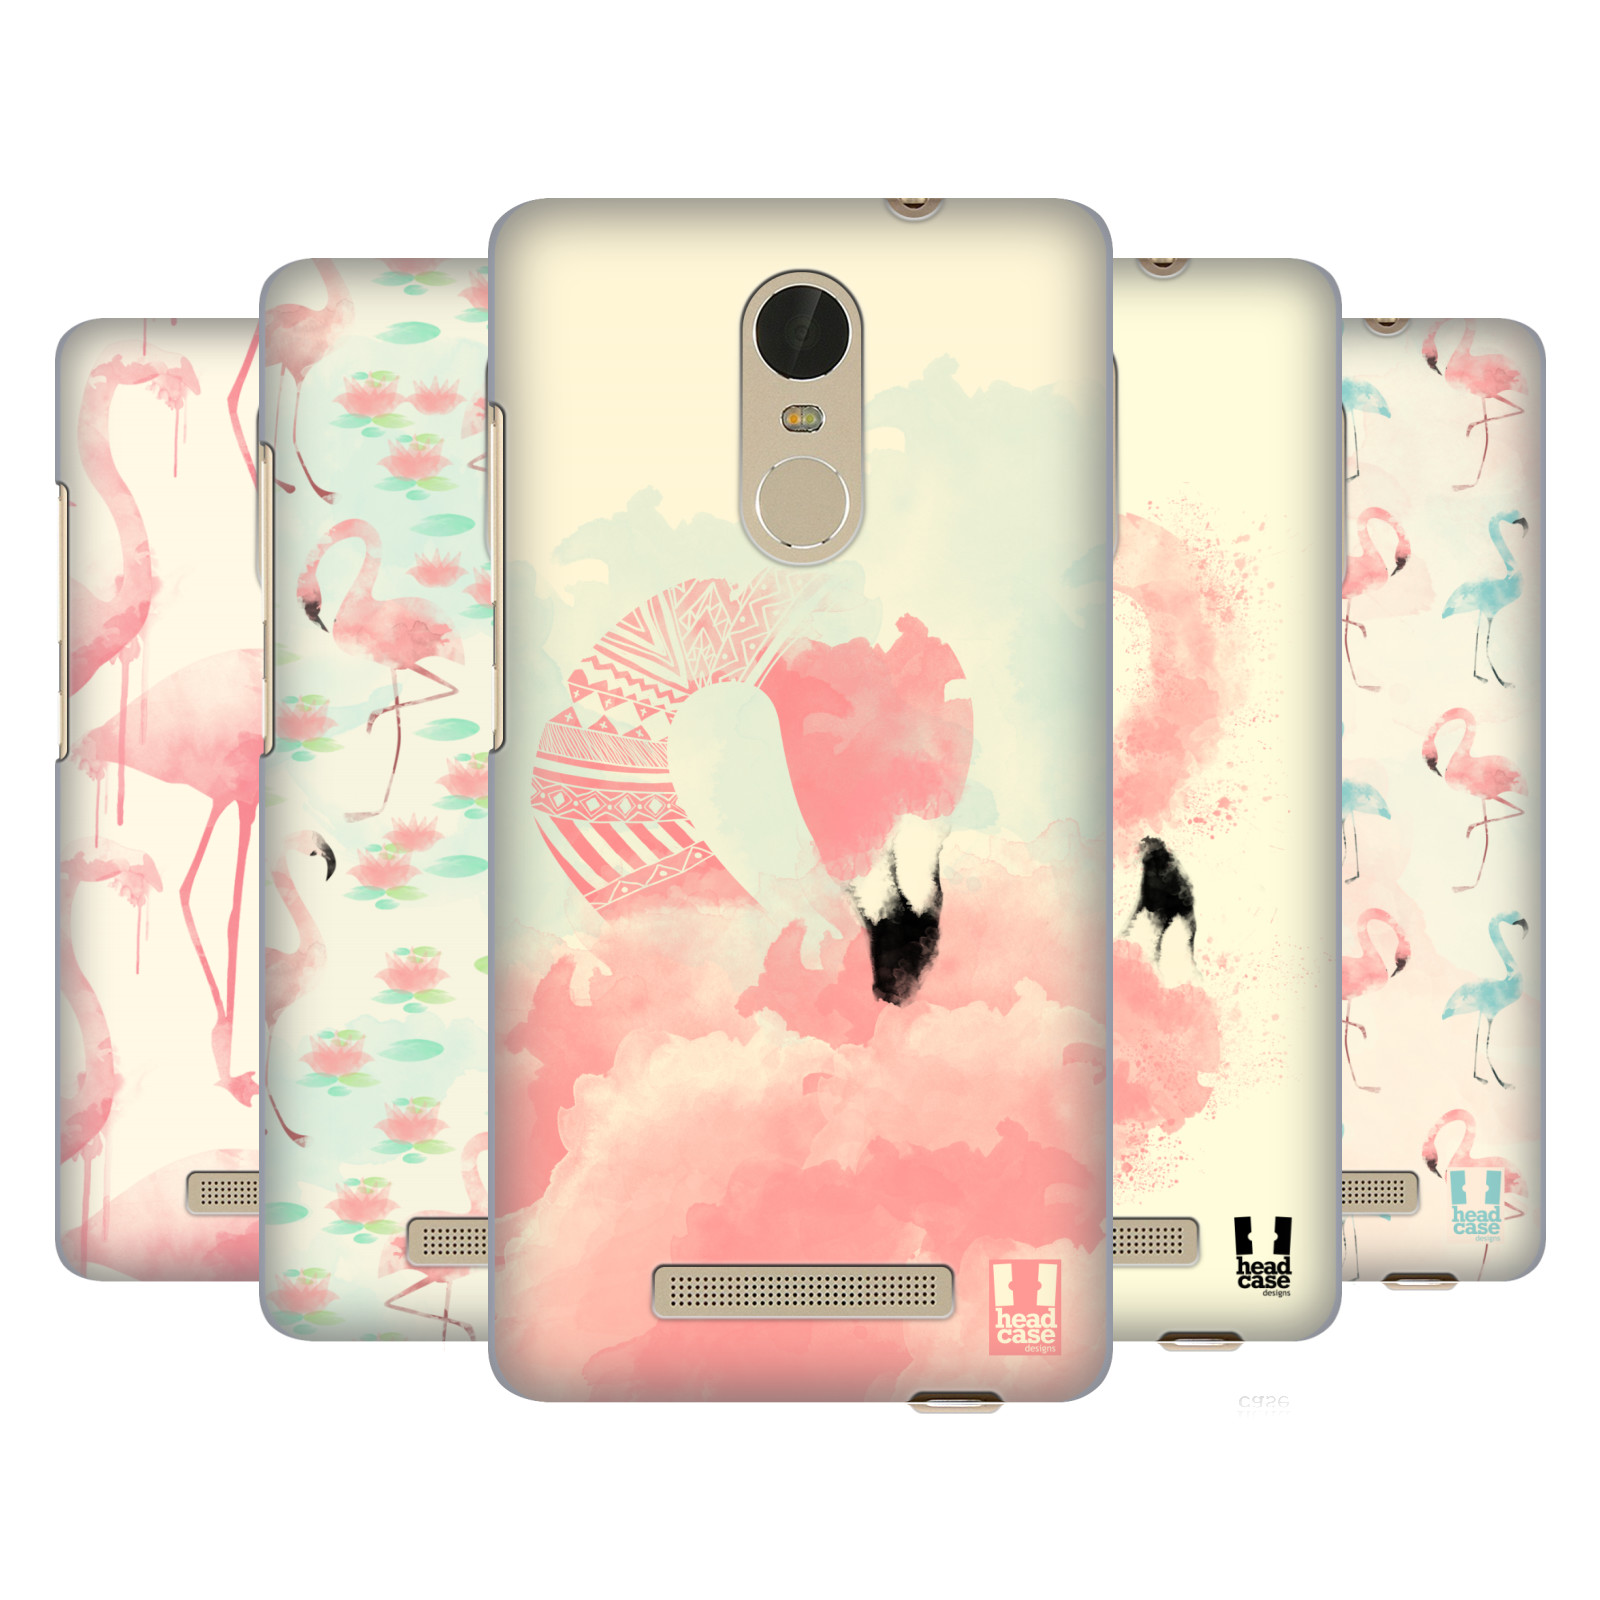 HEAD CASE DESIGNS FAB FLAMINGO HARD BACK CASE FOR XIAOMI PHONES